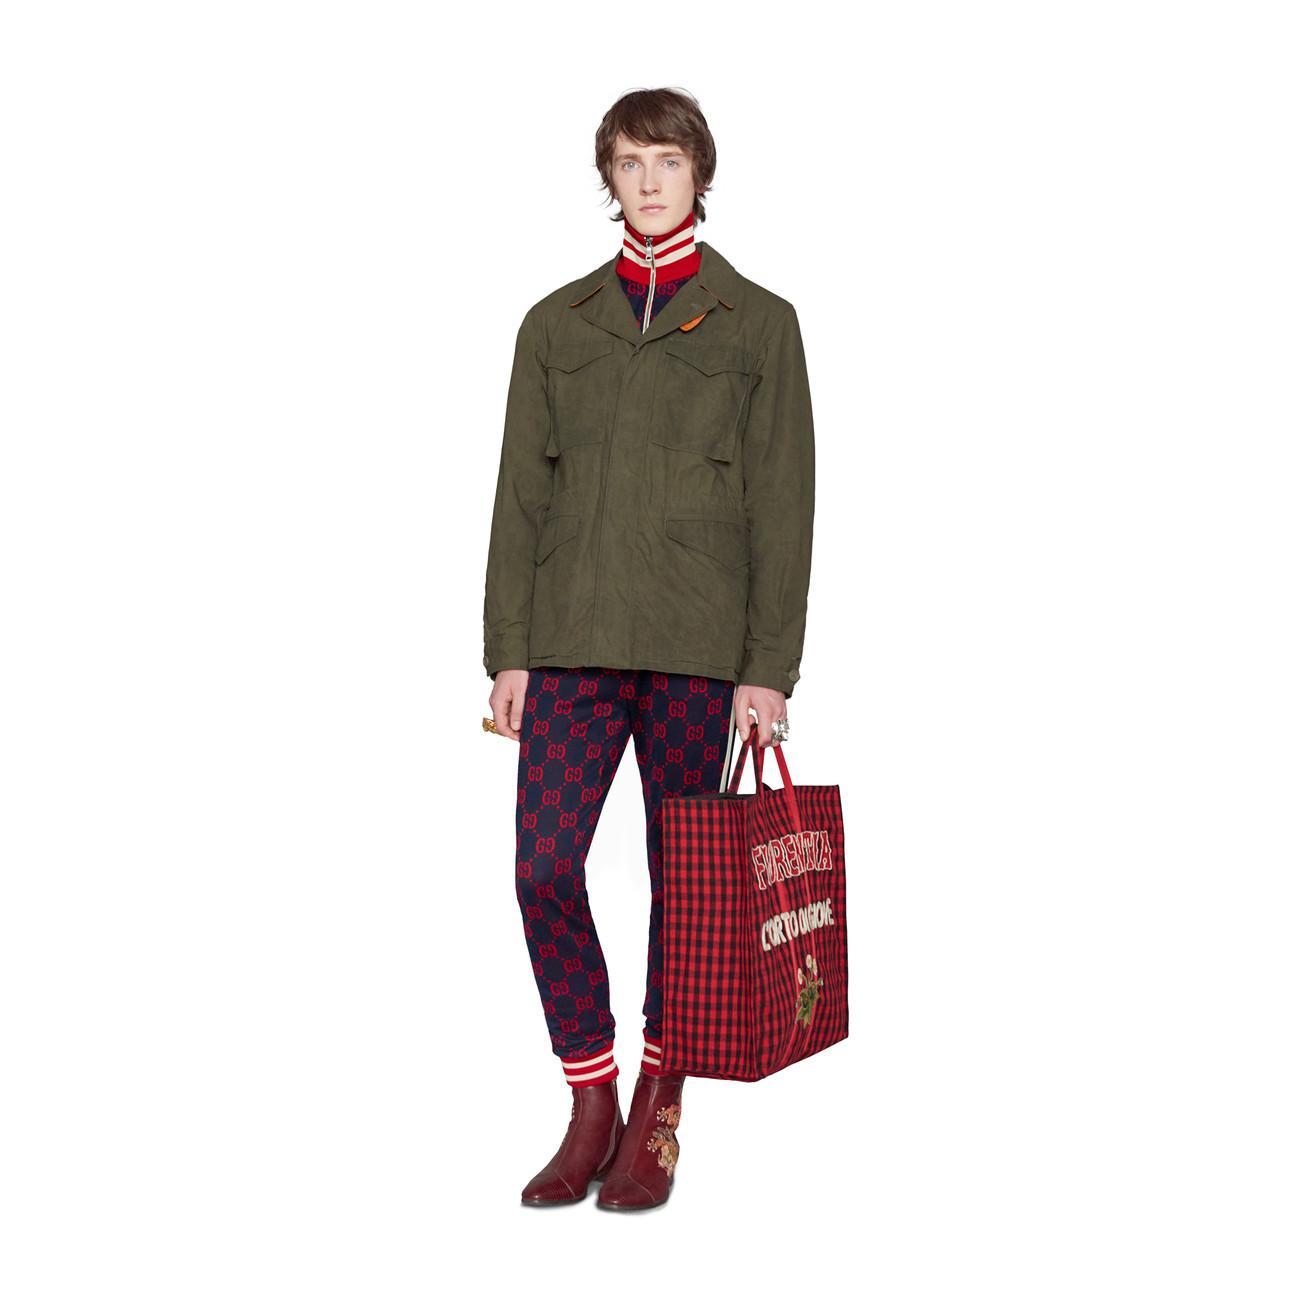 7a8afe5bd8f733 Gucci - Blue GG Jacquard Cotton Jacket for Men - Lyst. View fullscreen